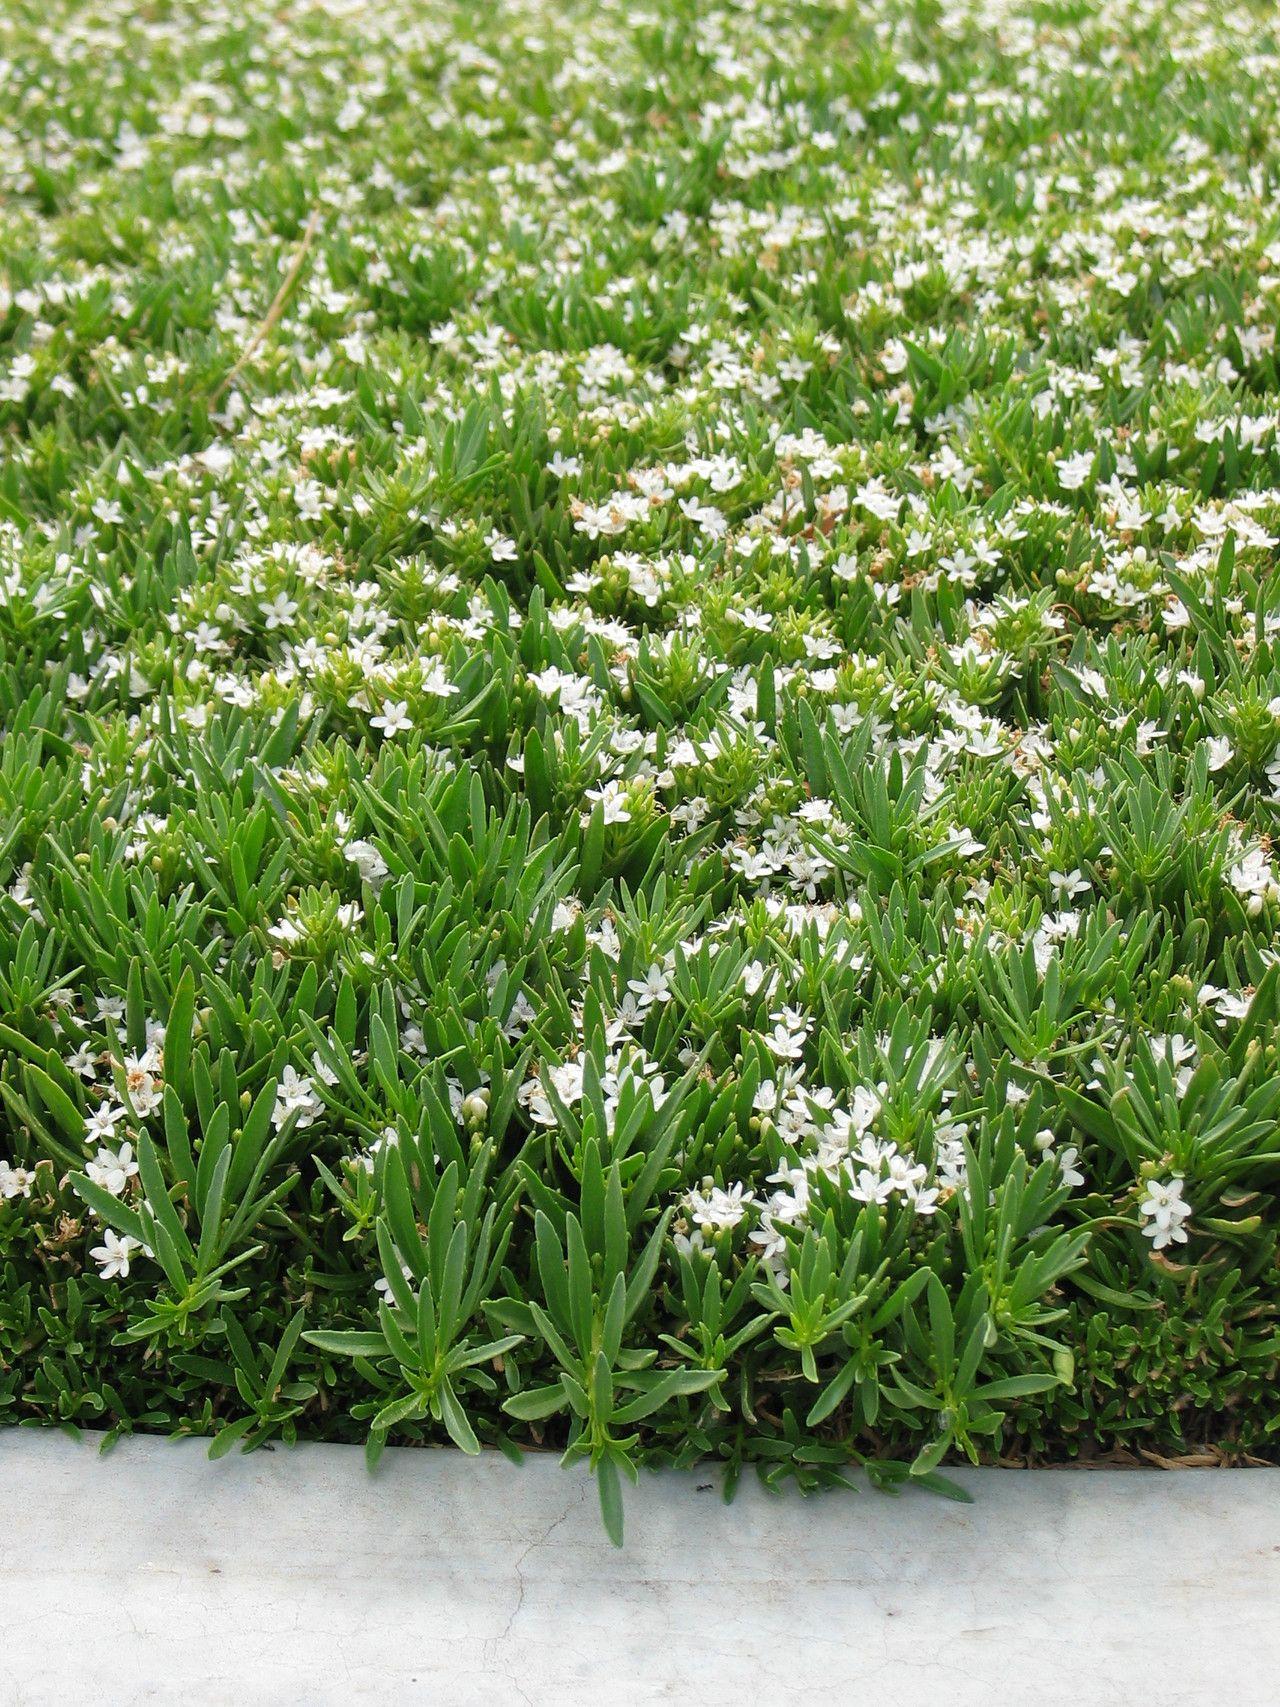 mypa myoporum parvifolium 39 prostratum 39 ground cover myoporum evergreen 3 6 inches high. Black Bedroom Furniture Sets. Home Design Ideas